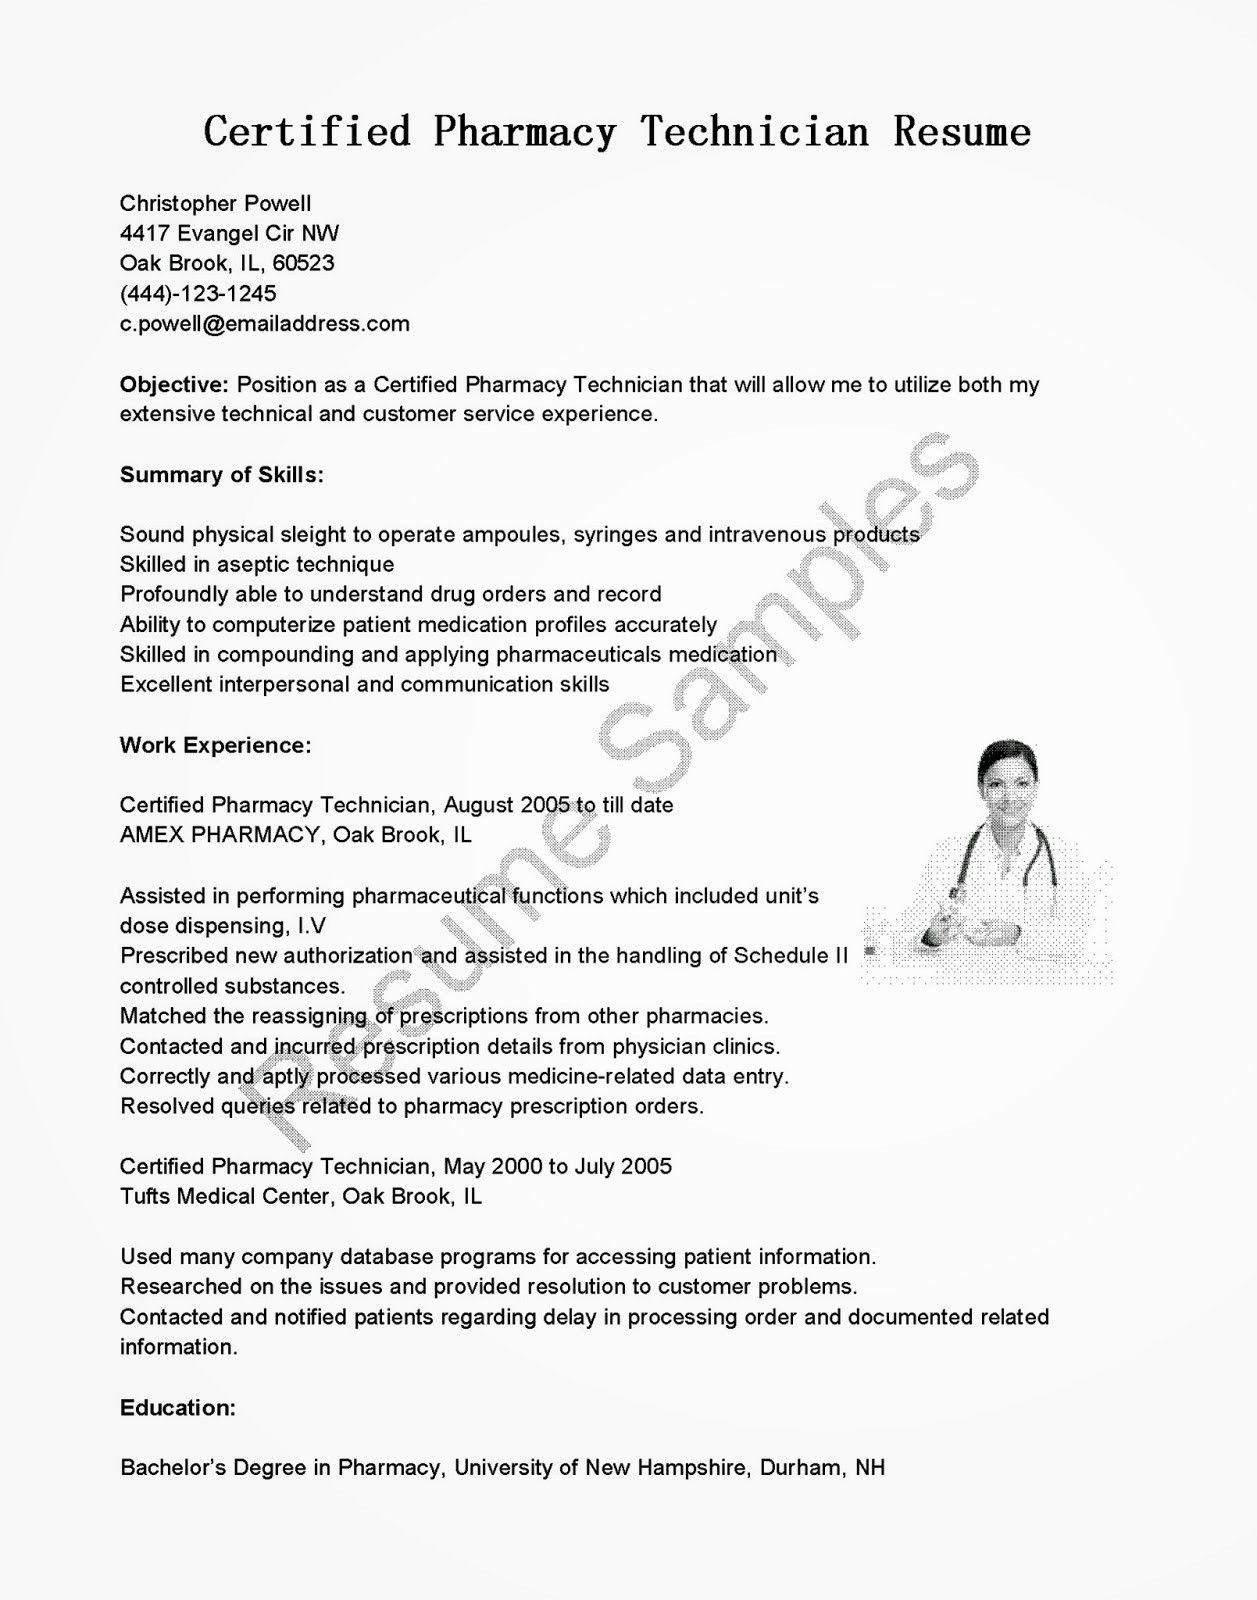 Elegant Resume Samples Certified Pharmacy Technician Resume Sample Pharmacy Technician Pharmacy Tech Job Resume Samples